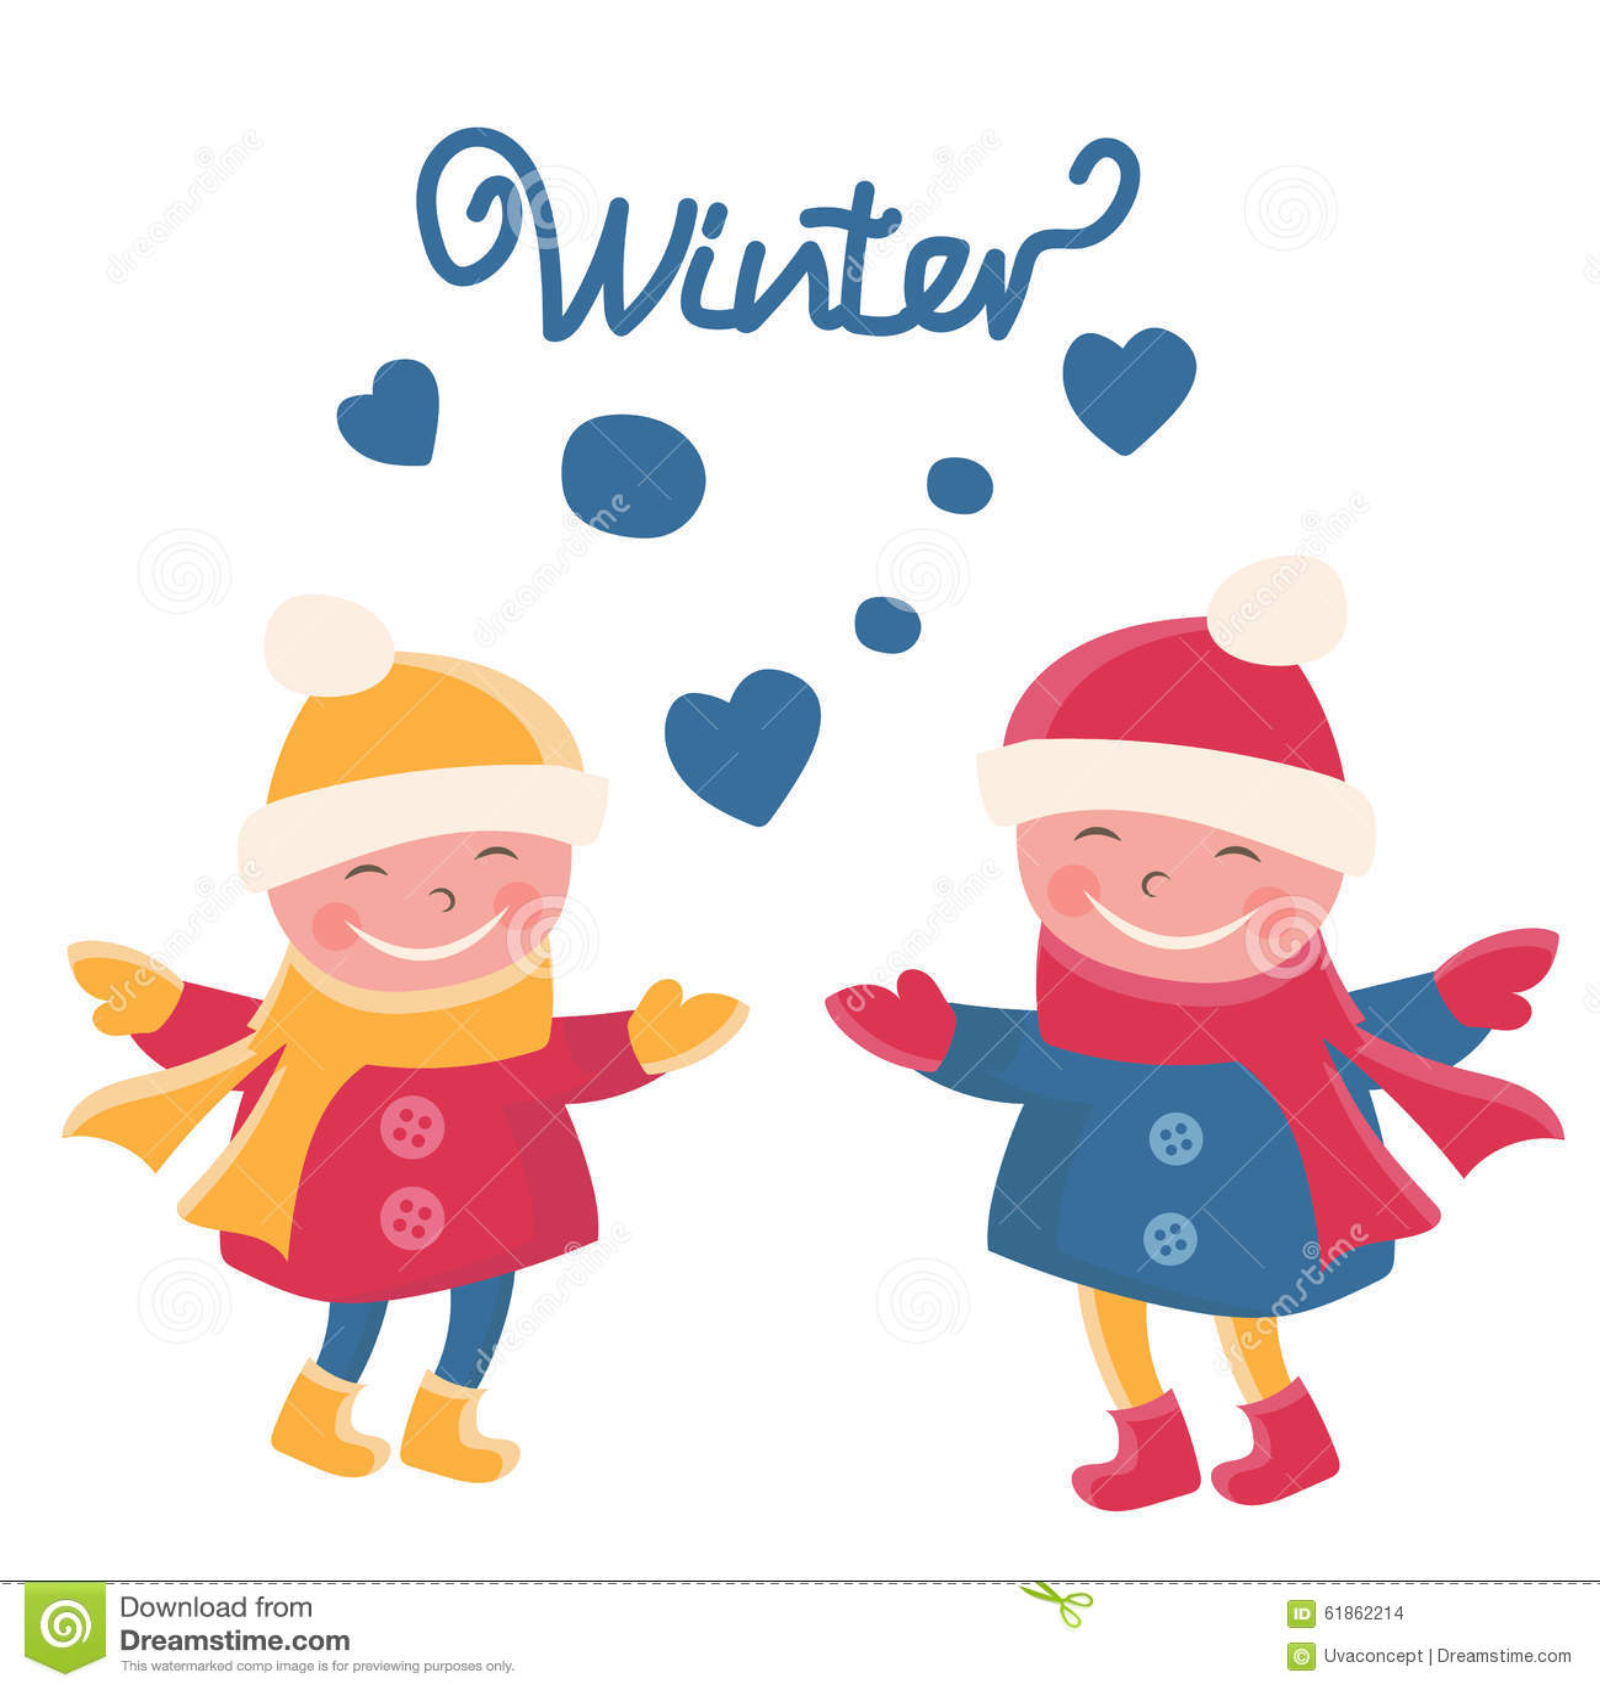 c04f995c977d Illustration Cartoon Doodle Girls In Winter Stock Vector ...